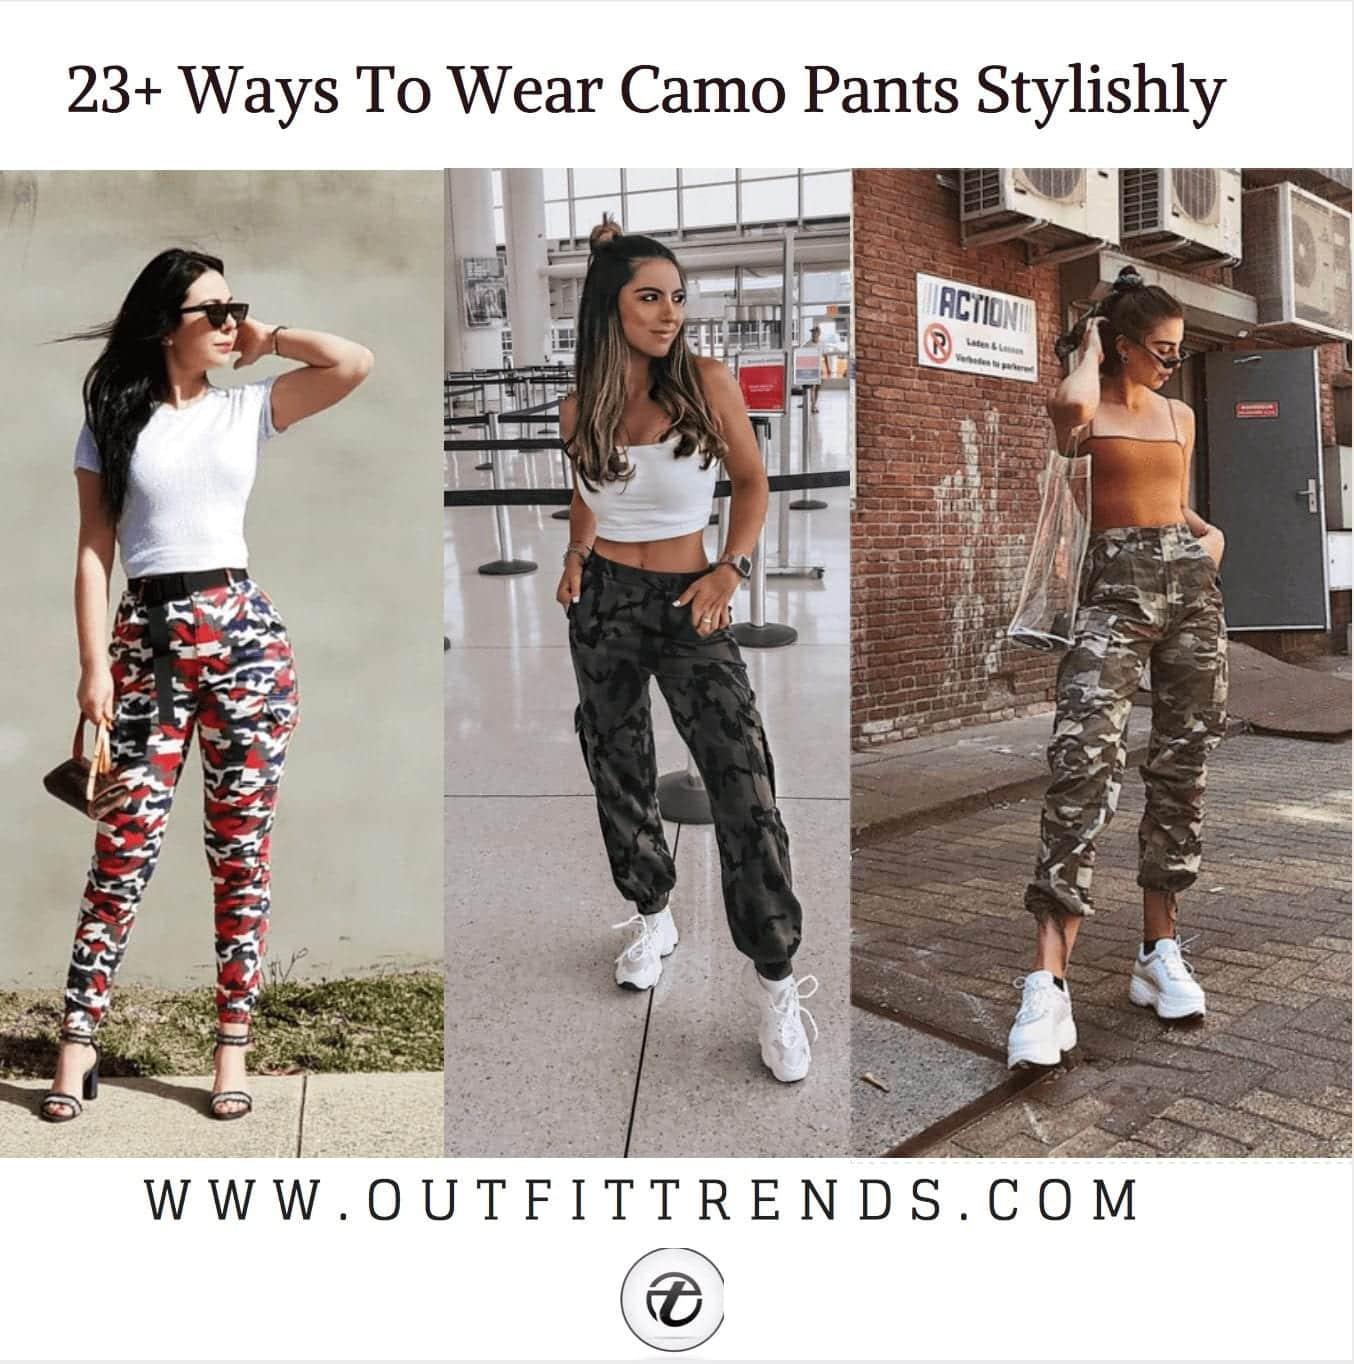 9c531cf6b61 Outfits with Camo Pants-23 Ways To Wear Camo Pants Stylishly